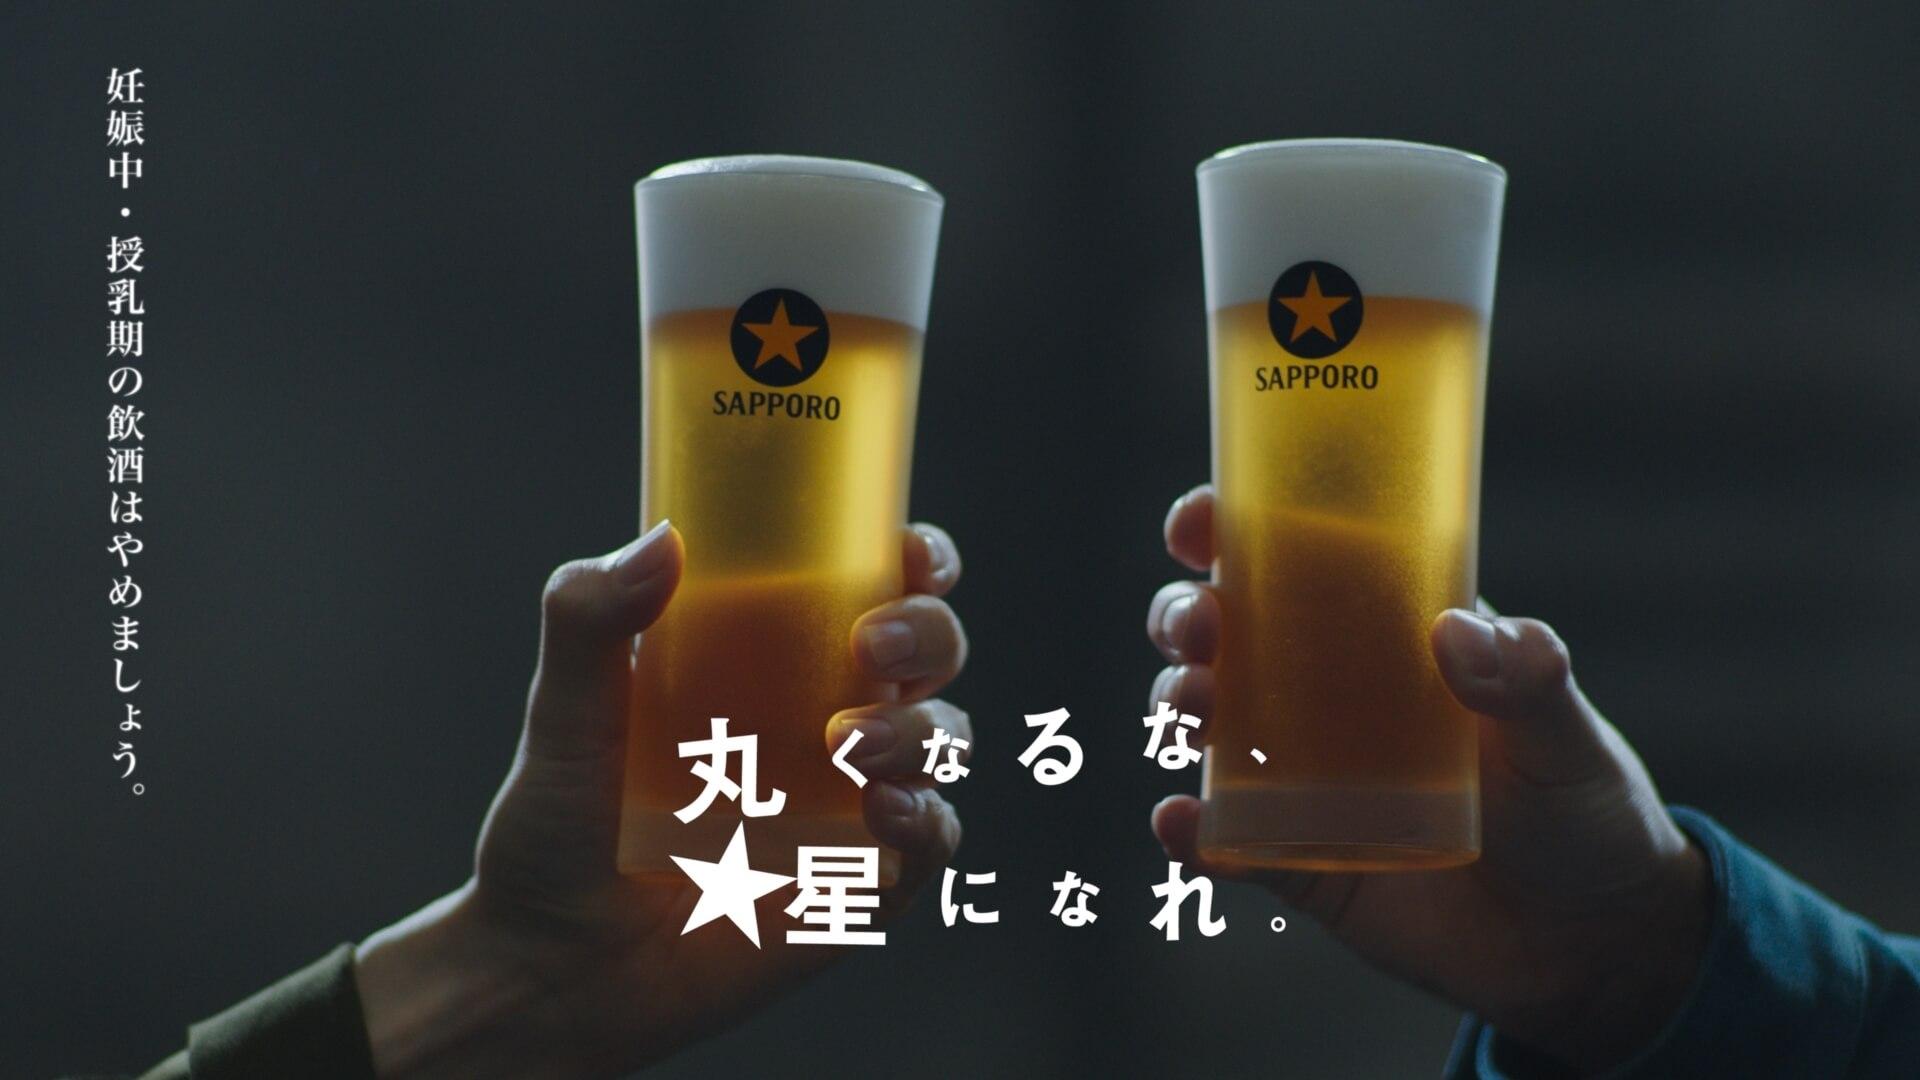 King Gnu常田大希が語る大人とは?サッポロ生ビール黒ラベルのCM「大人エレベーター」に登場! gourmet200327_sapporo_tsuneda_14